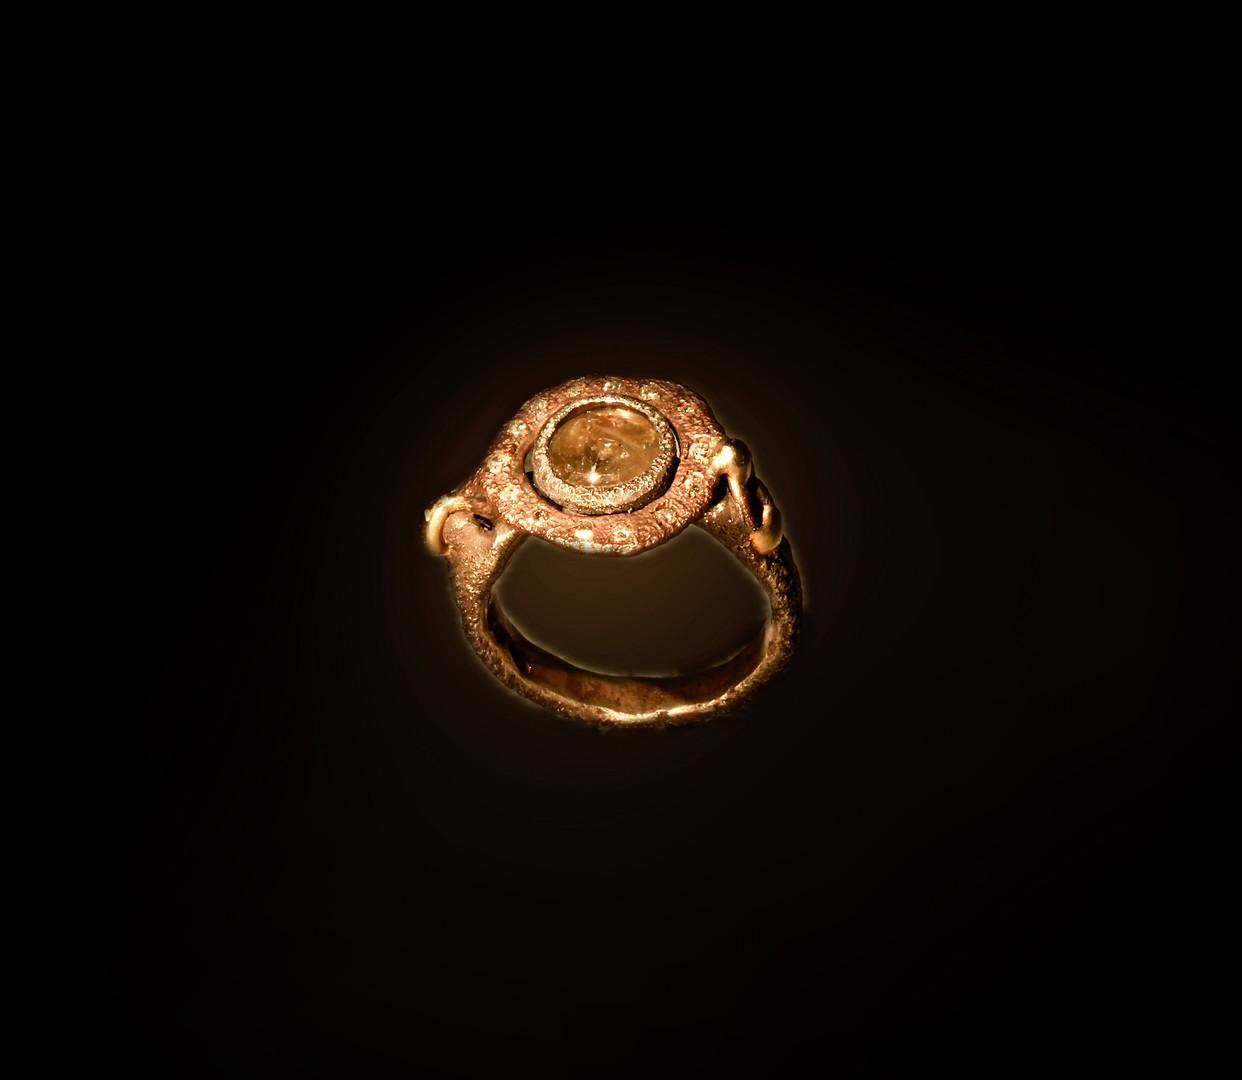 Anello in argento, bronzo, oro e diamanti